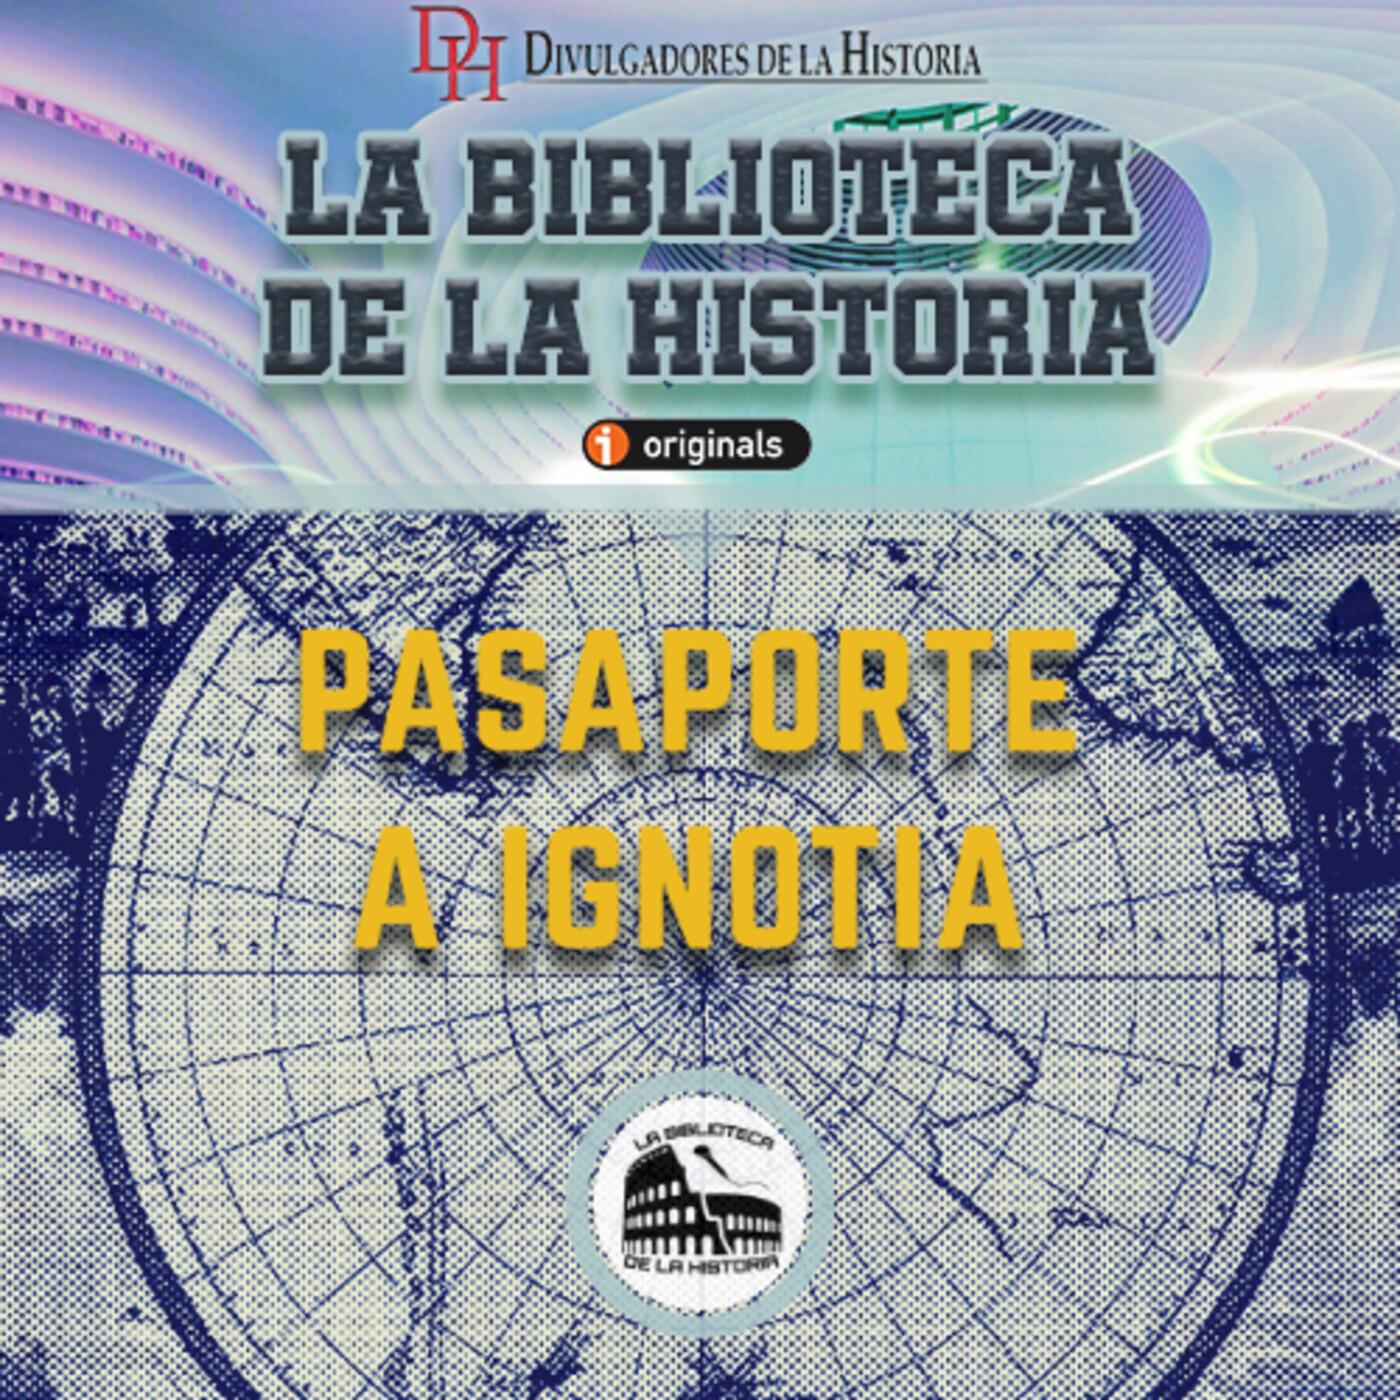 Avance próximo programa #Pasaporte a Ignotia#